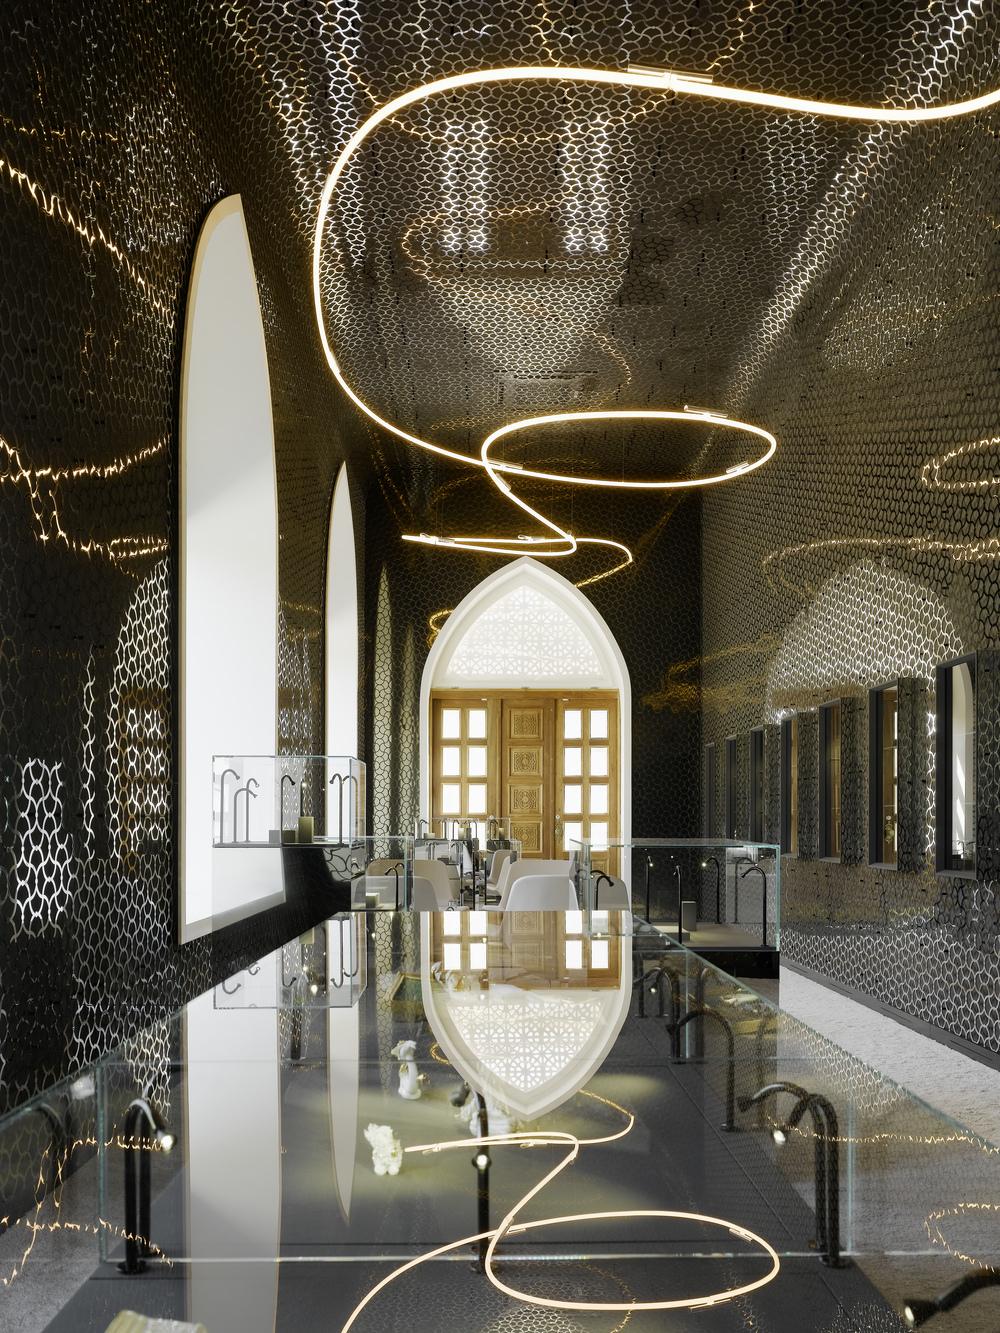 Innenarchitektur Stuttgart - Glockenturm Tashkent, Juwelier, Design